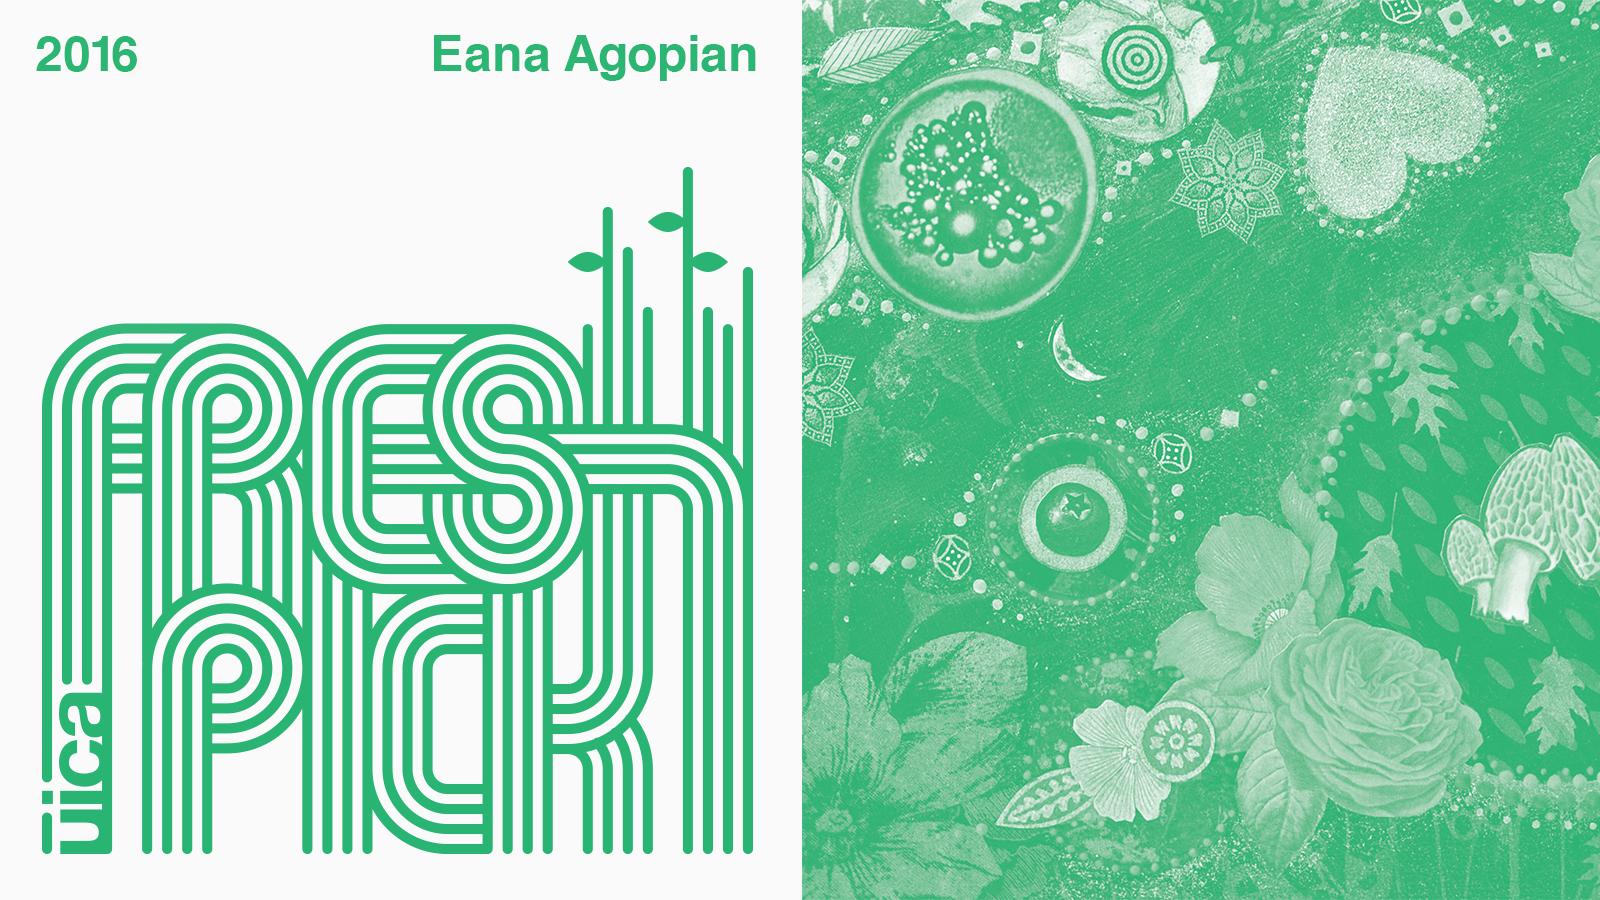 UICA Fresh Pick Exhibition Eana Agopian logo